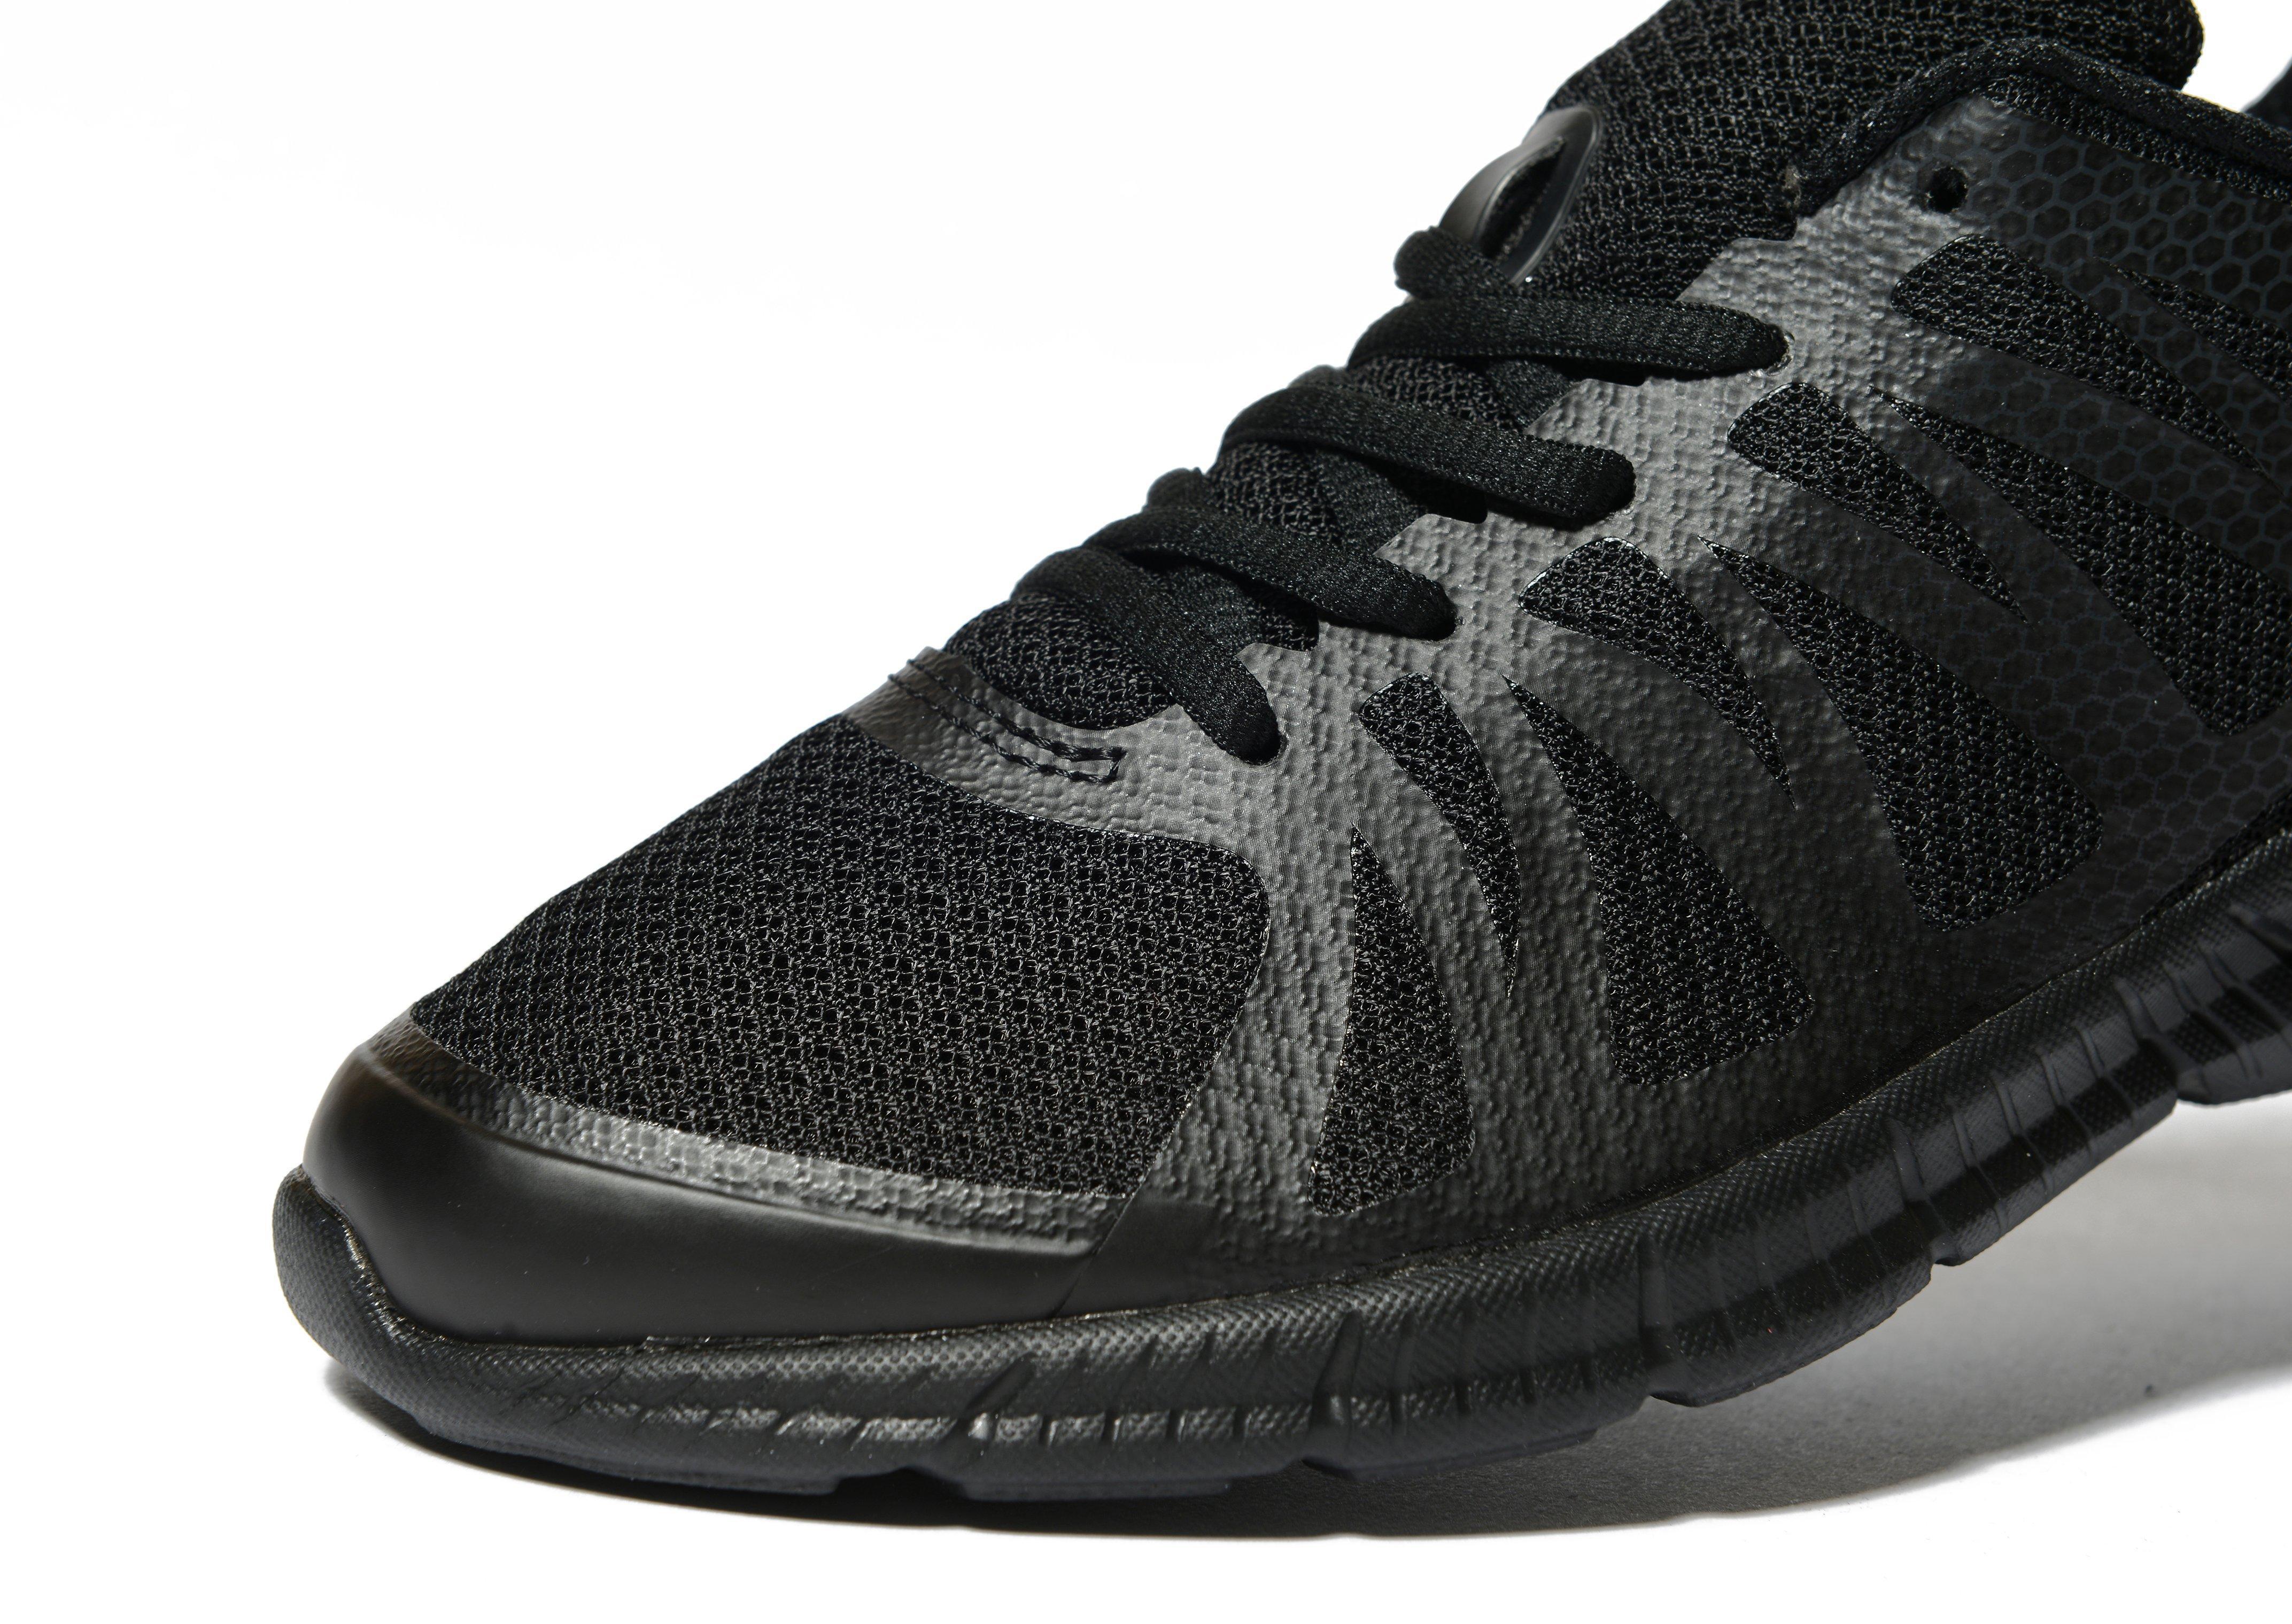 Fila Synthetic Finition in Black/Silver